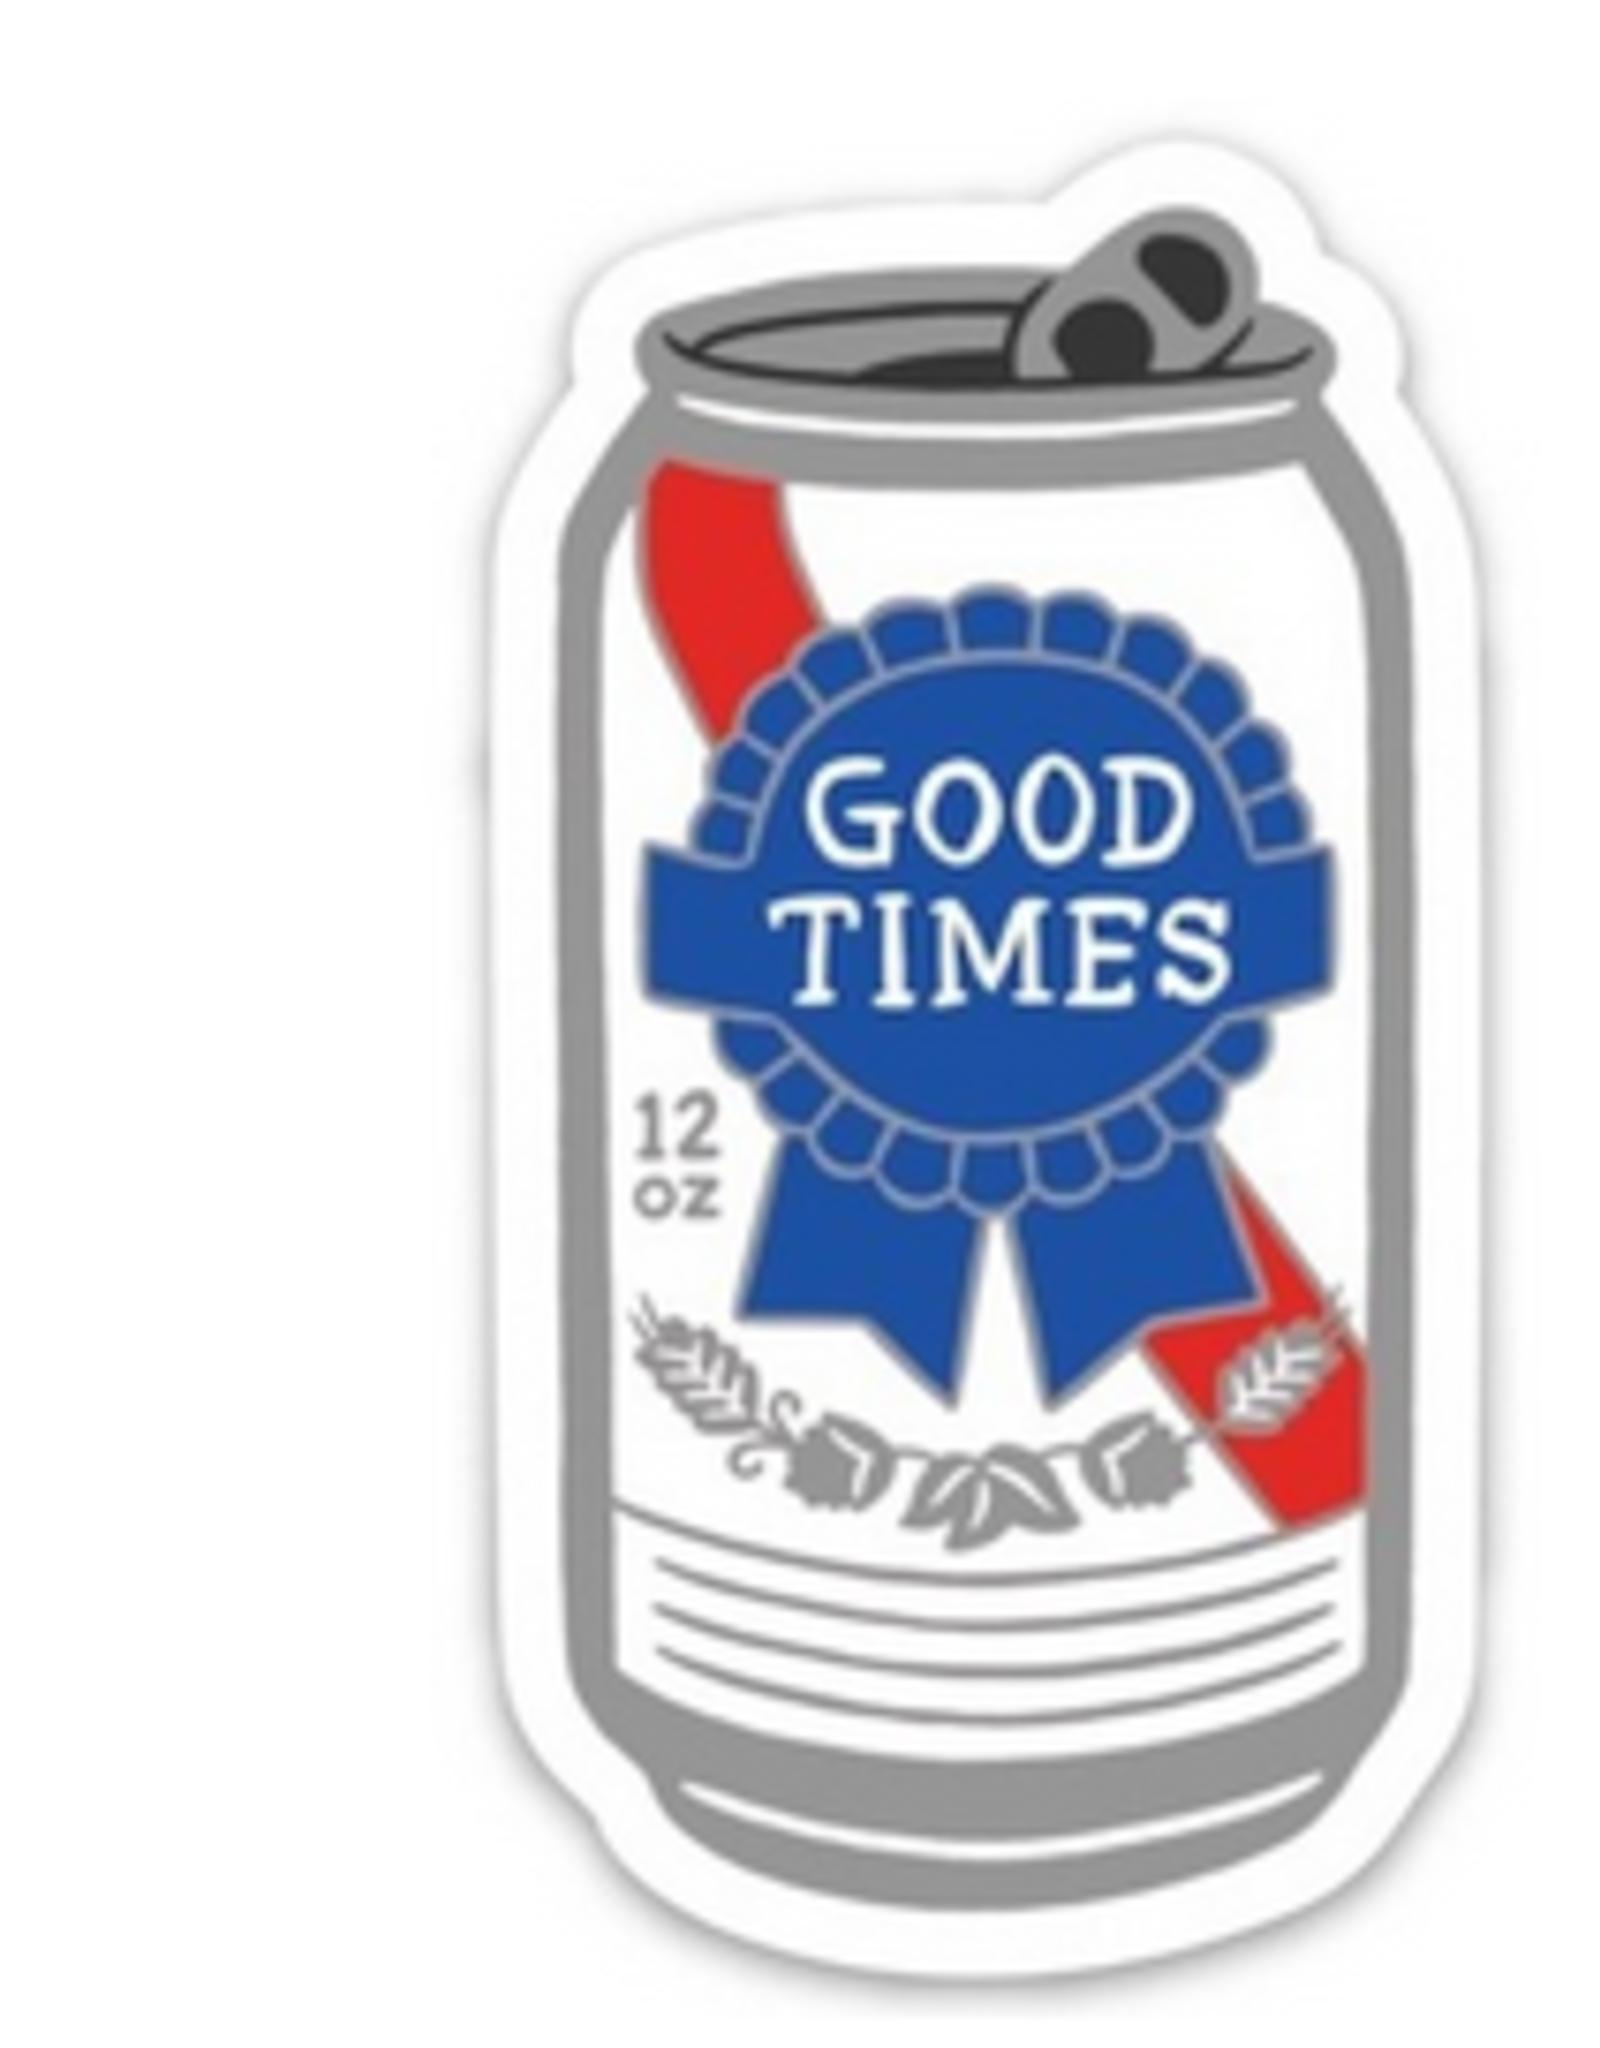 Good Times PBR Beer Sticker